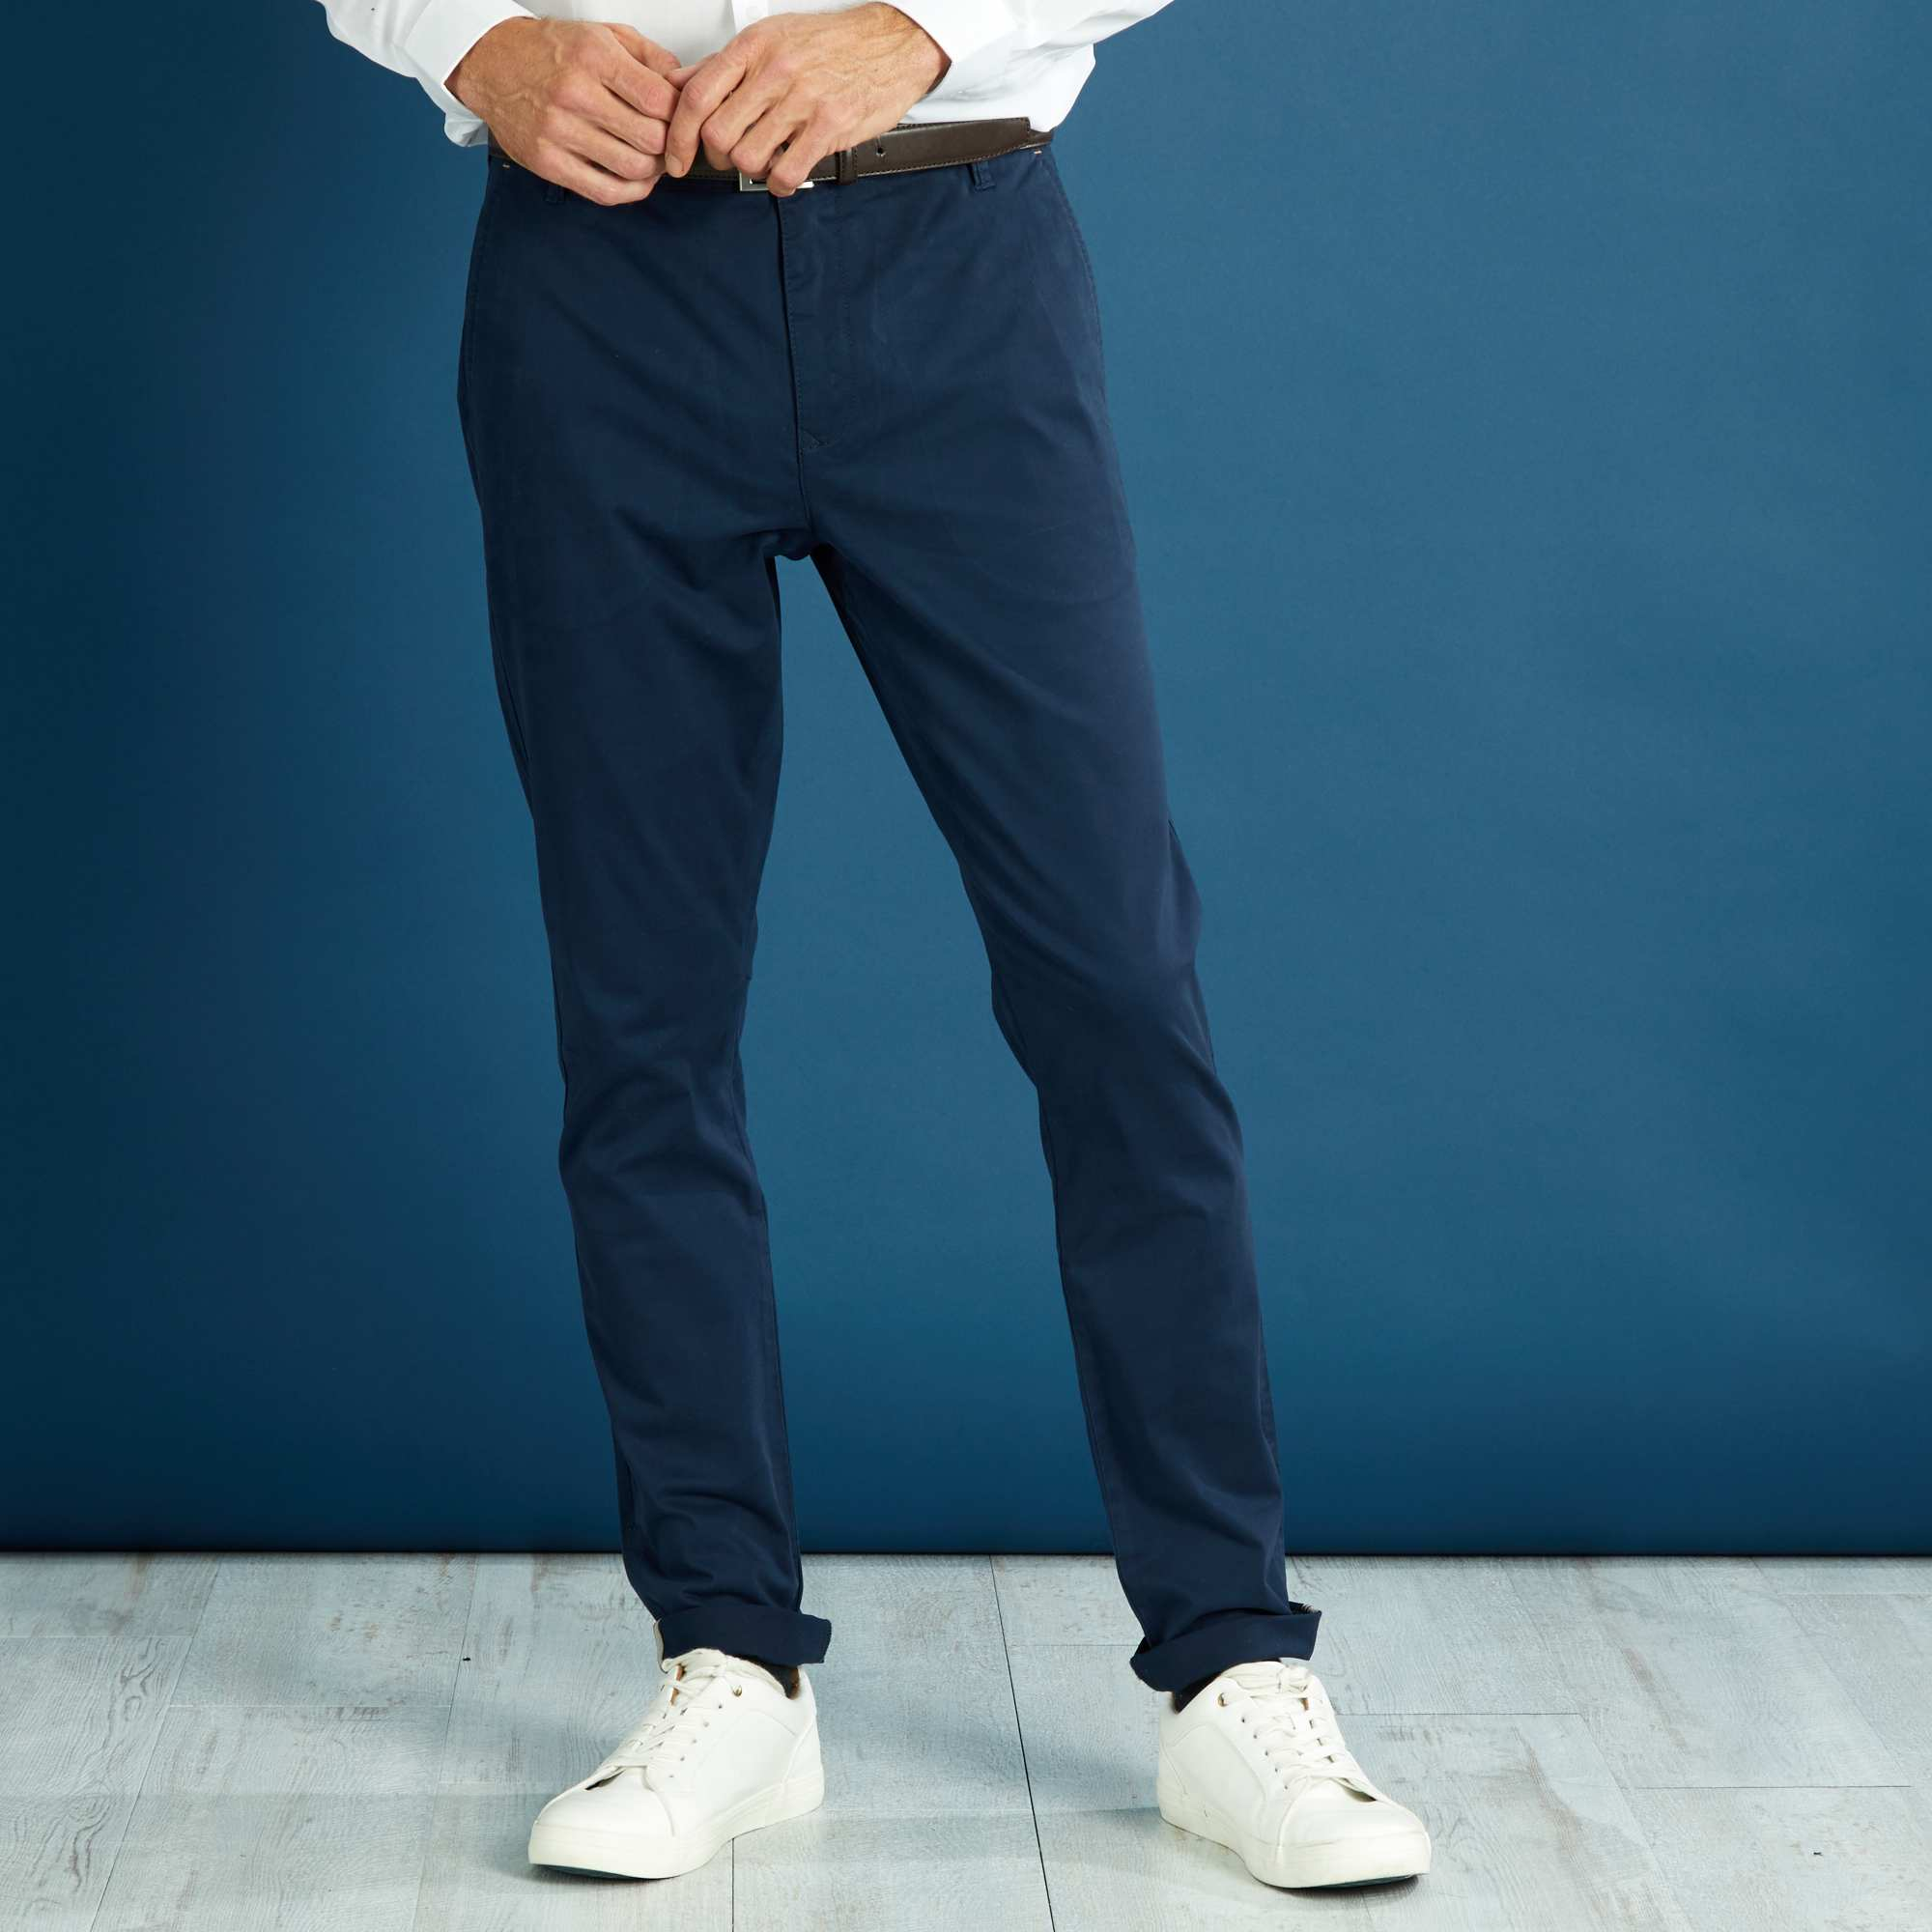 pantalon chino skinny homme bleu marine kiabi 10 00. Black Bedroom Furniture Sets. Home Design Ideas